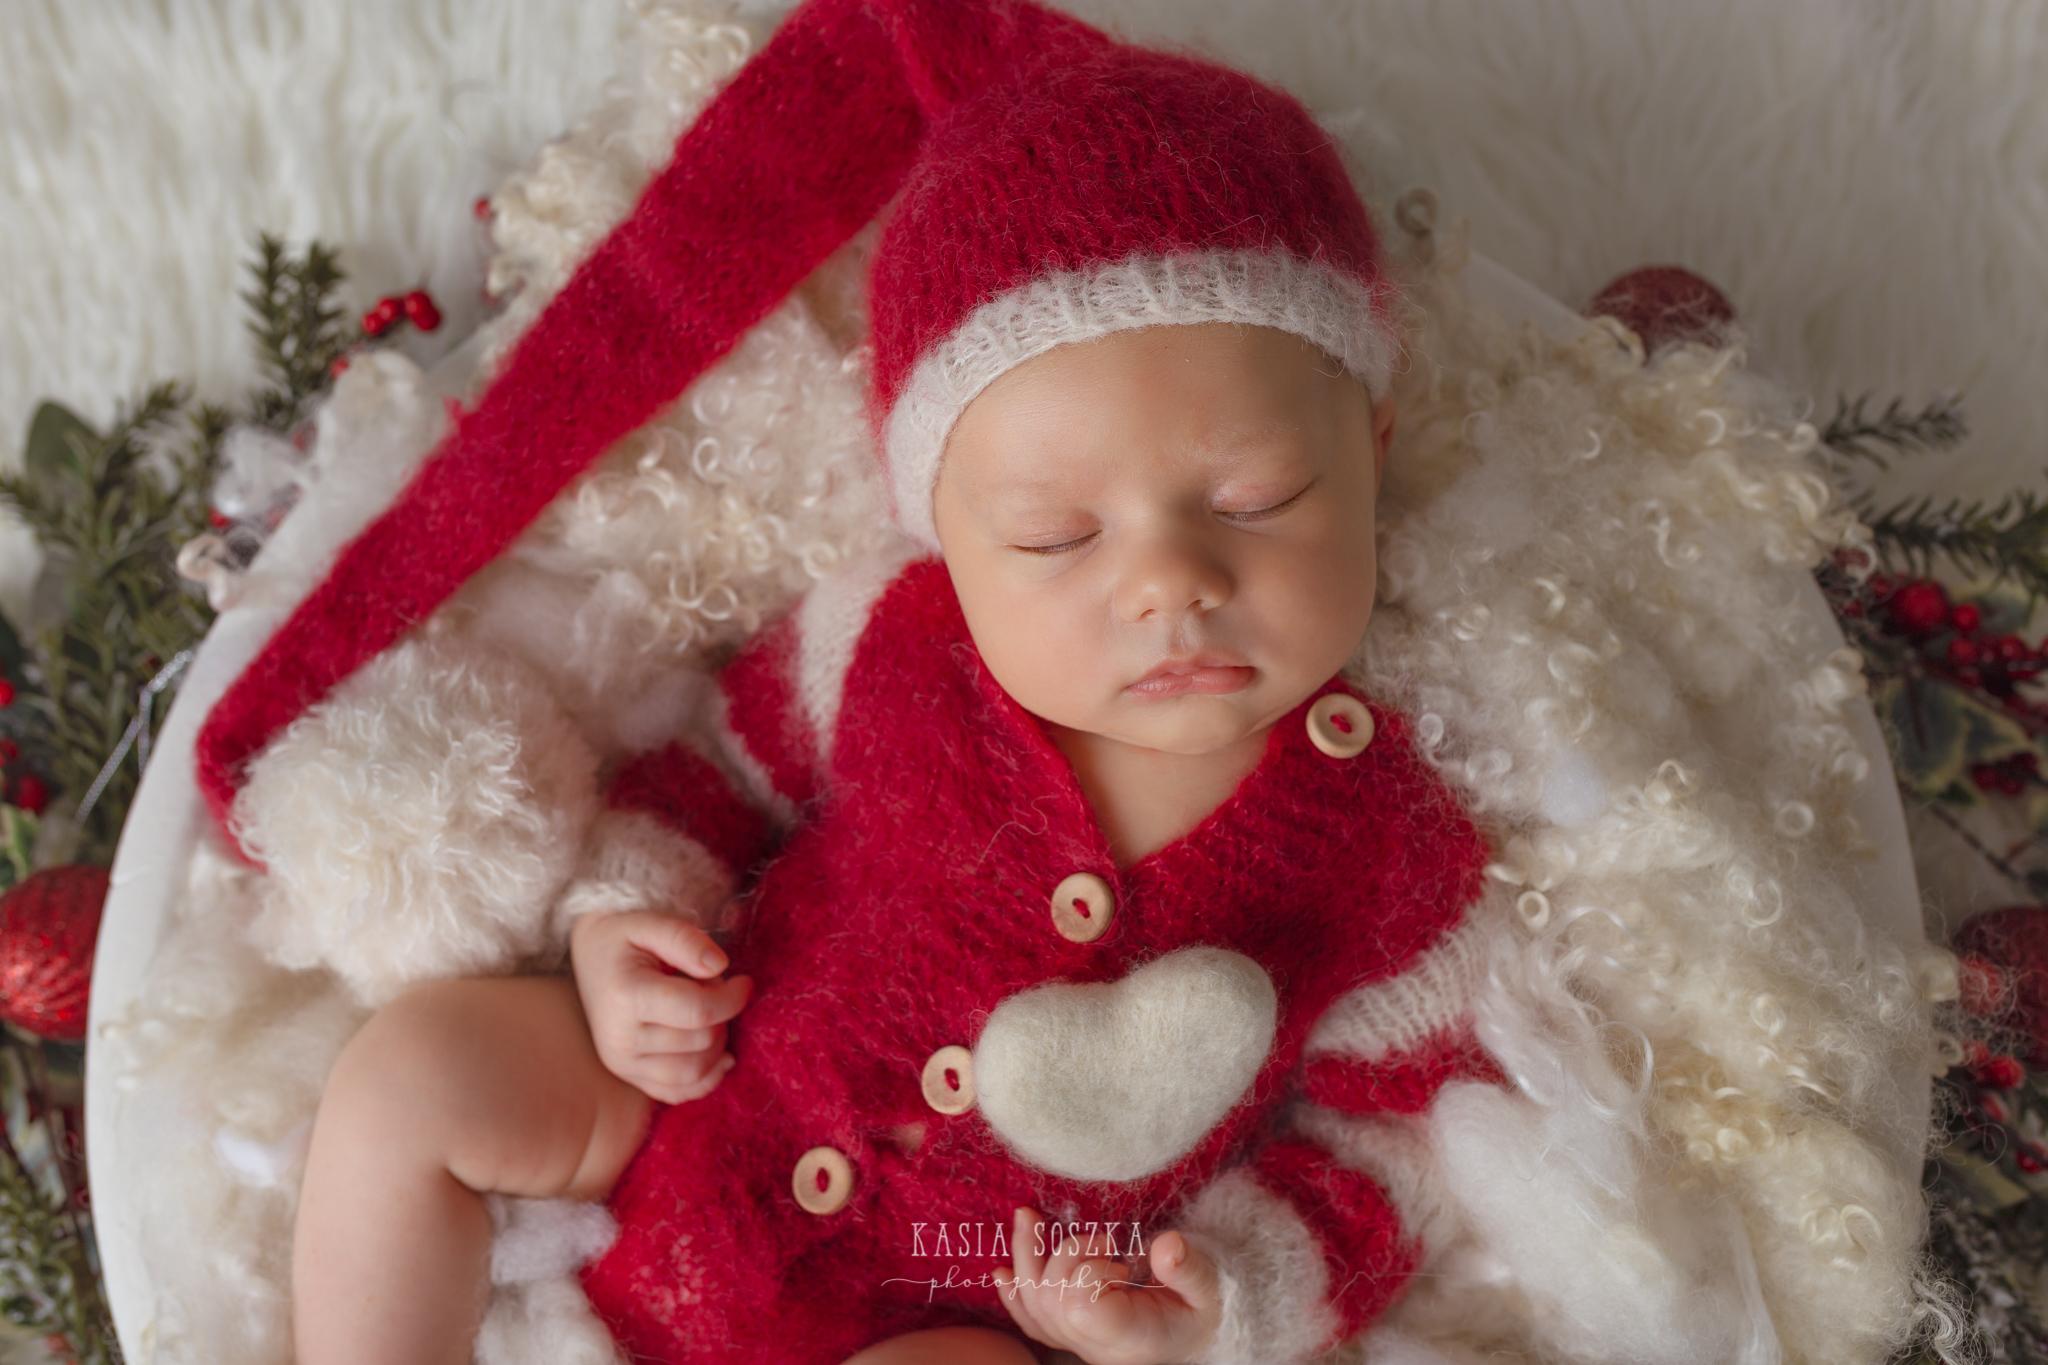 Newborn photography Leeds-York-Bradford-Harrogate: Christmas newborn session in Leeds, Yorkshire. Cute newborn baby girl in Santa Claus outfit.